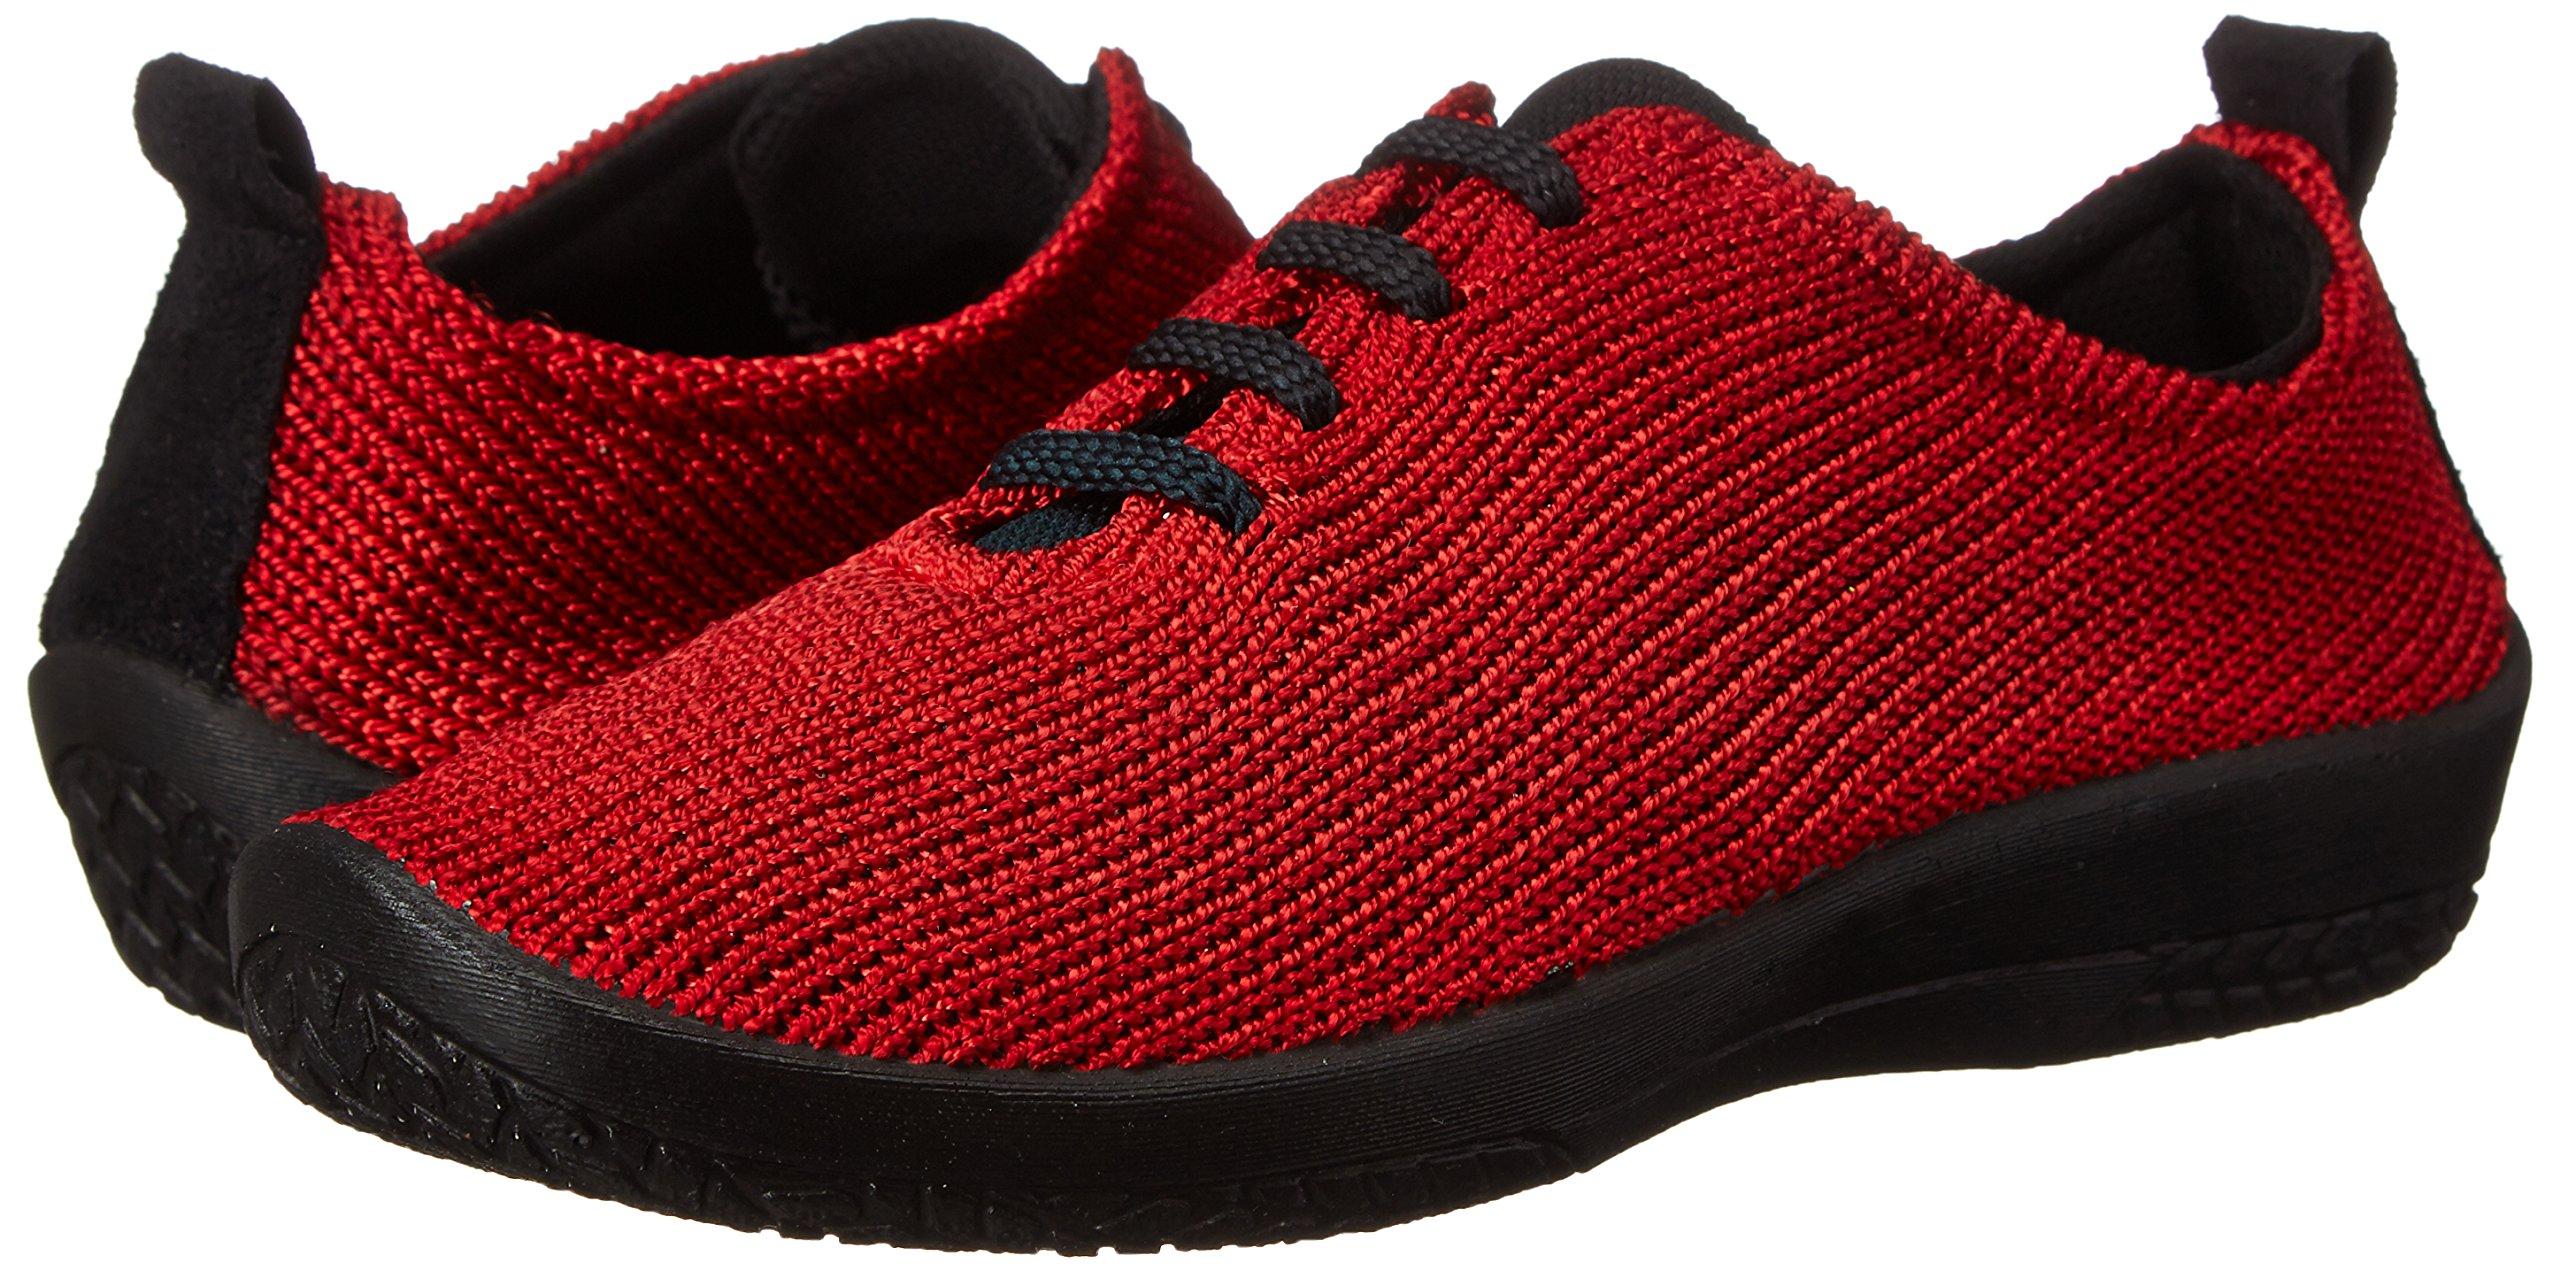 Arcopedico Women's Ls 1151 Red Fabric Casual 9 B(M) US